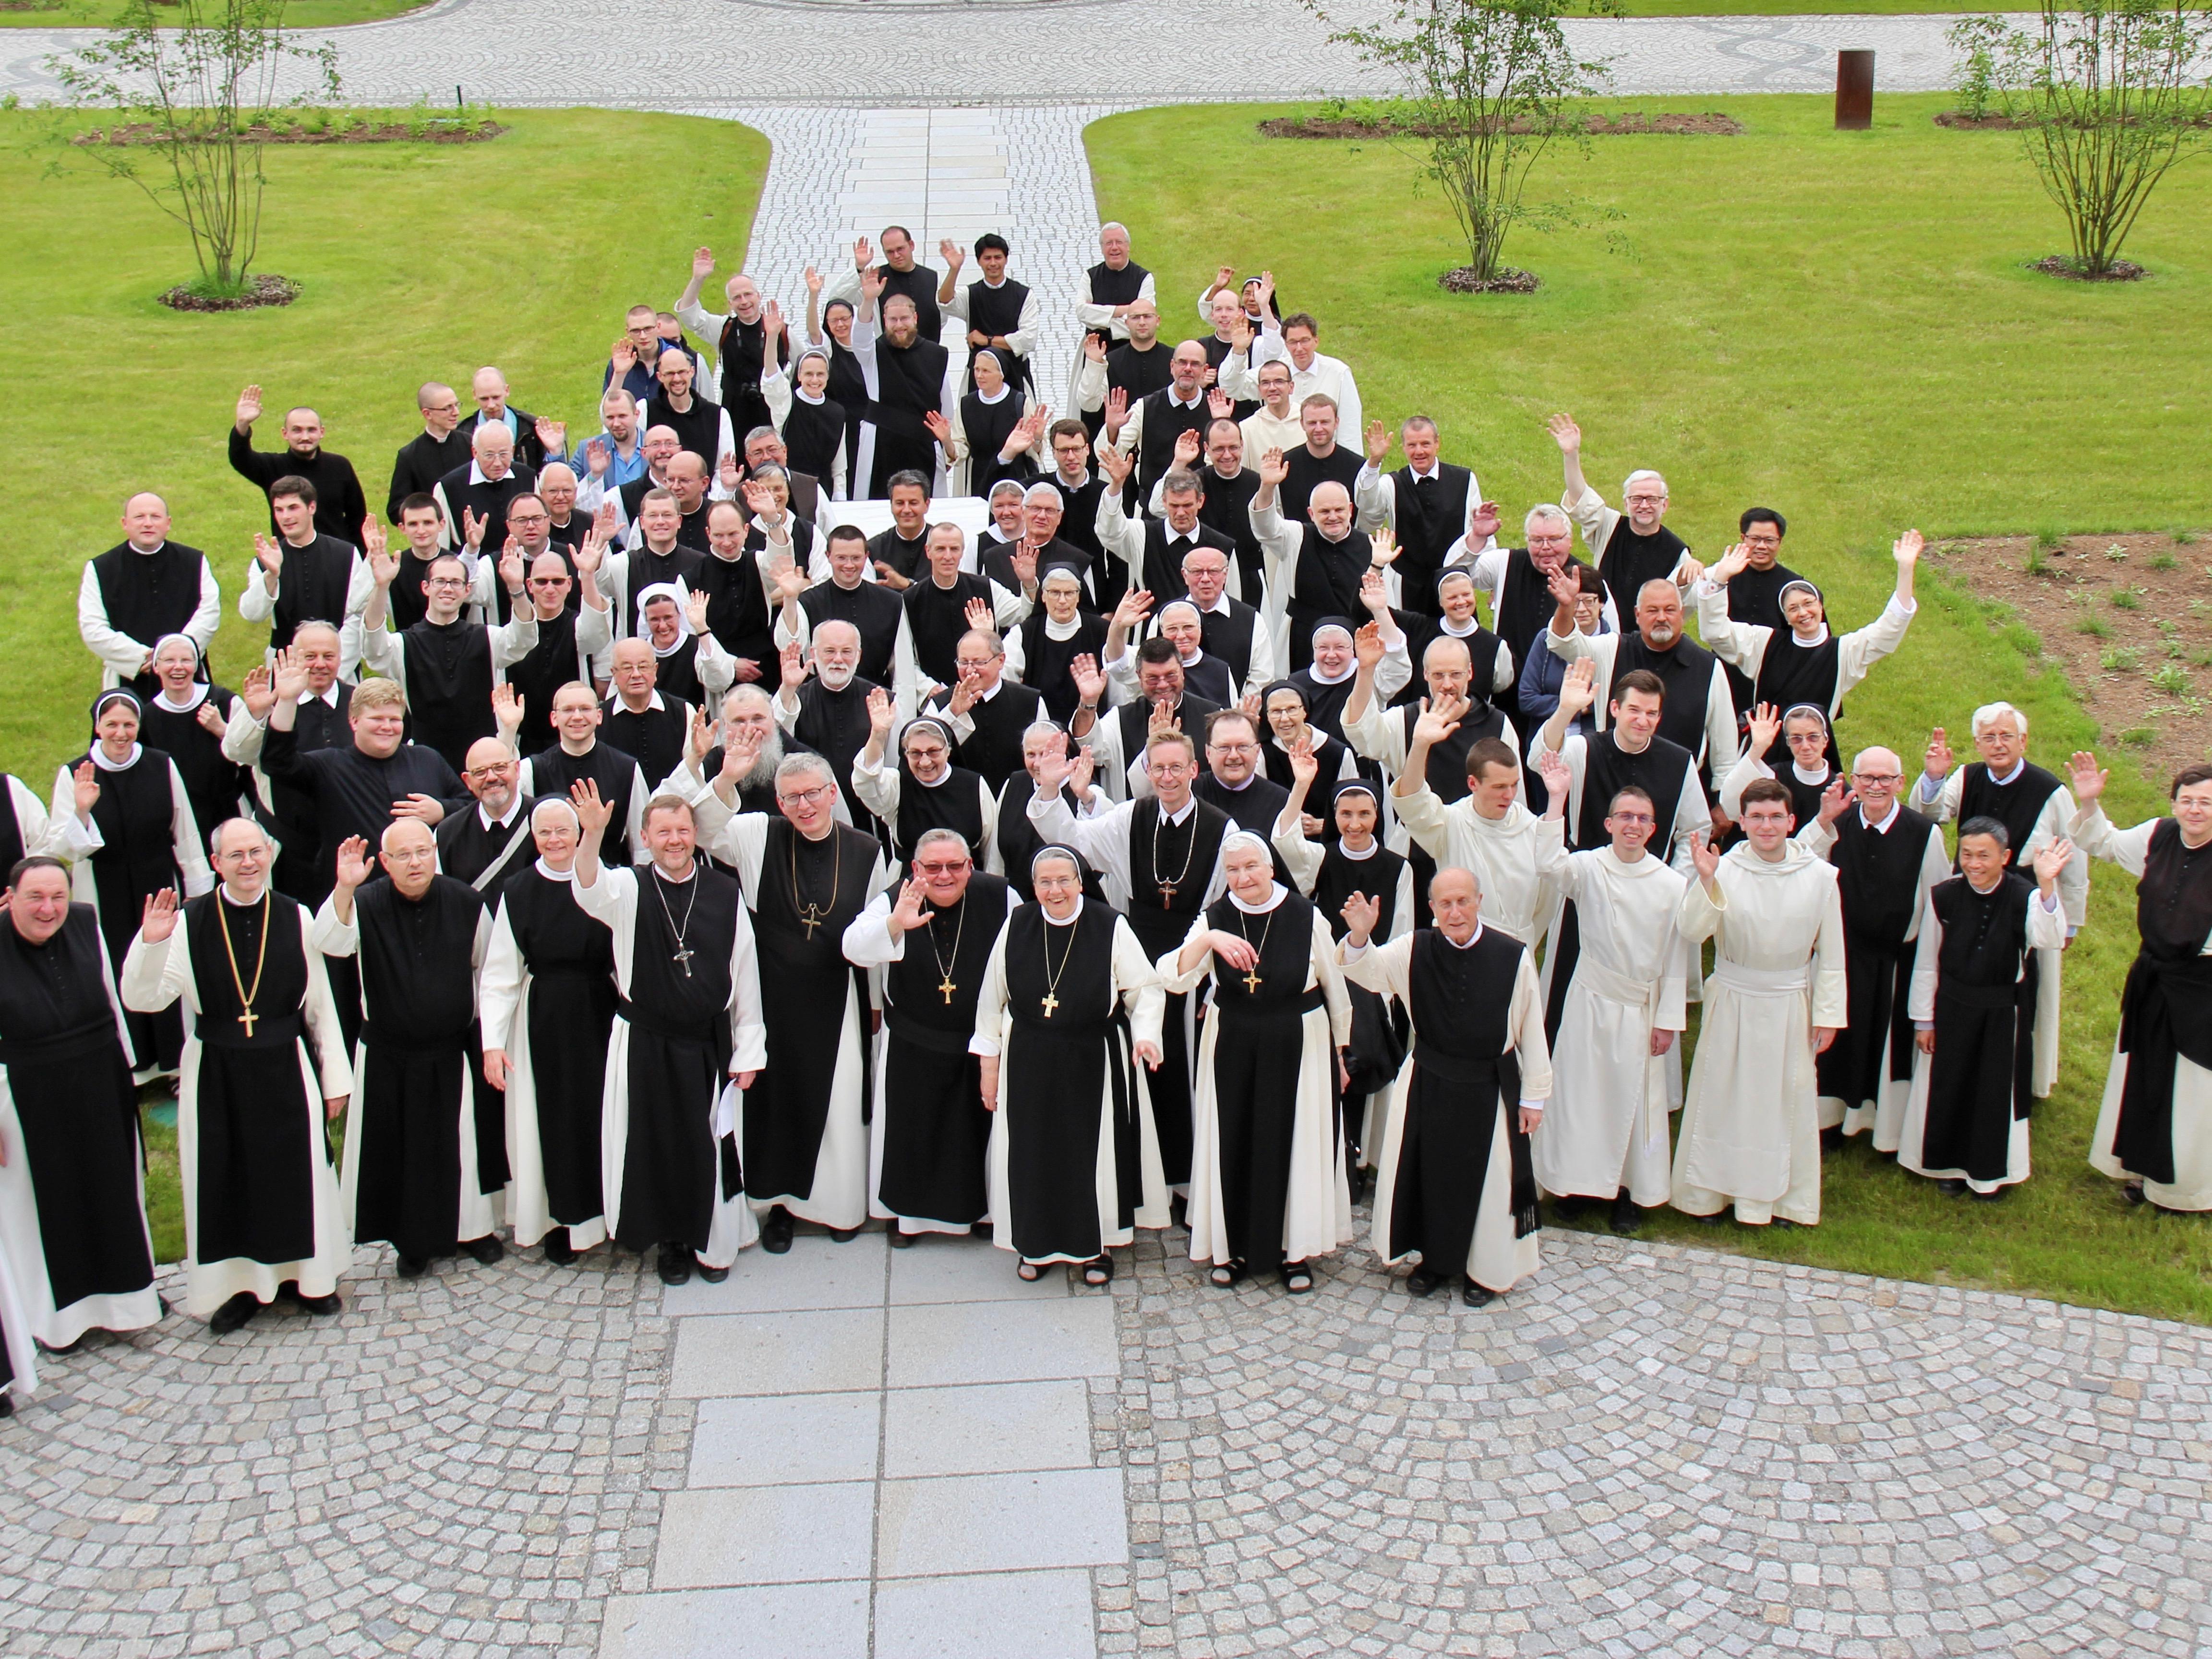 Spendenkonten fr AsylwerberInnen - Gemeinde Wilhering